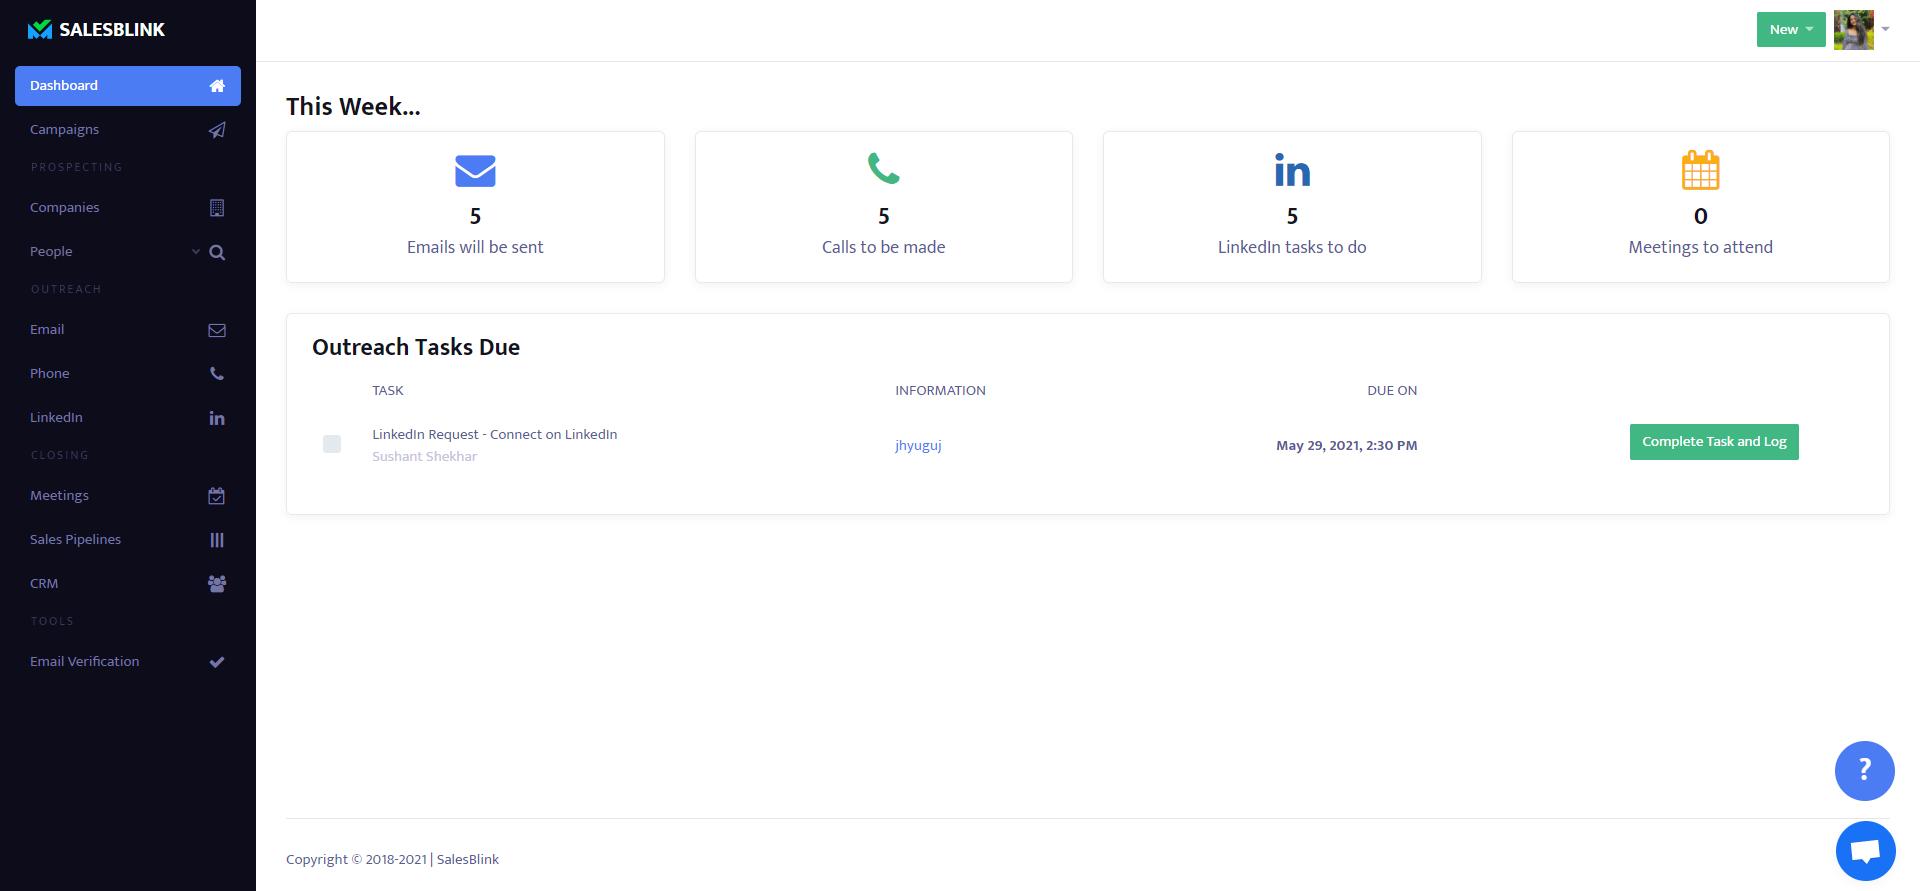 SalesBlink Dashboard